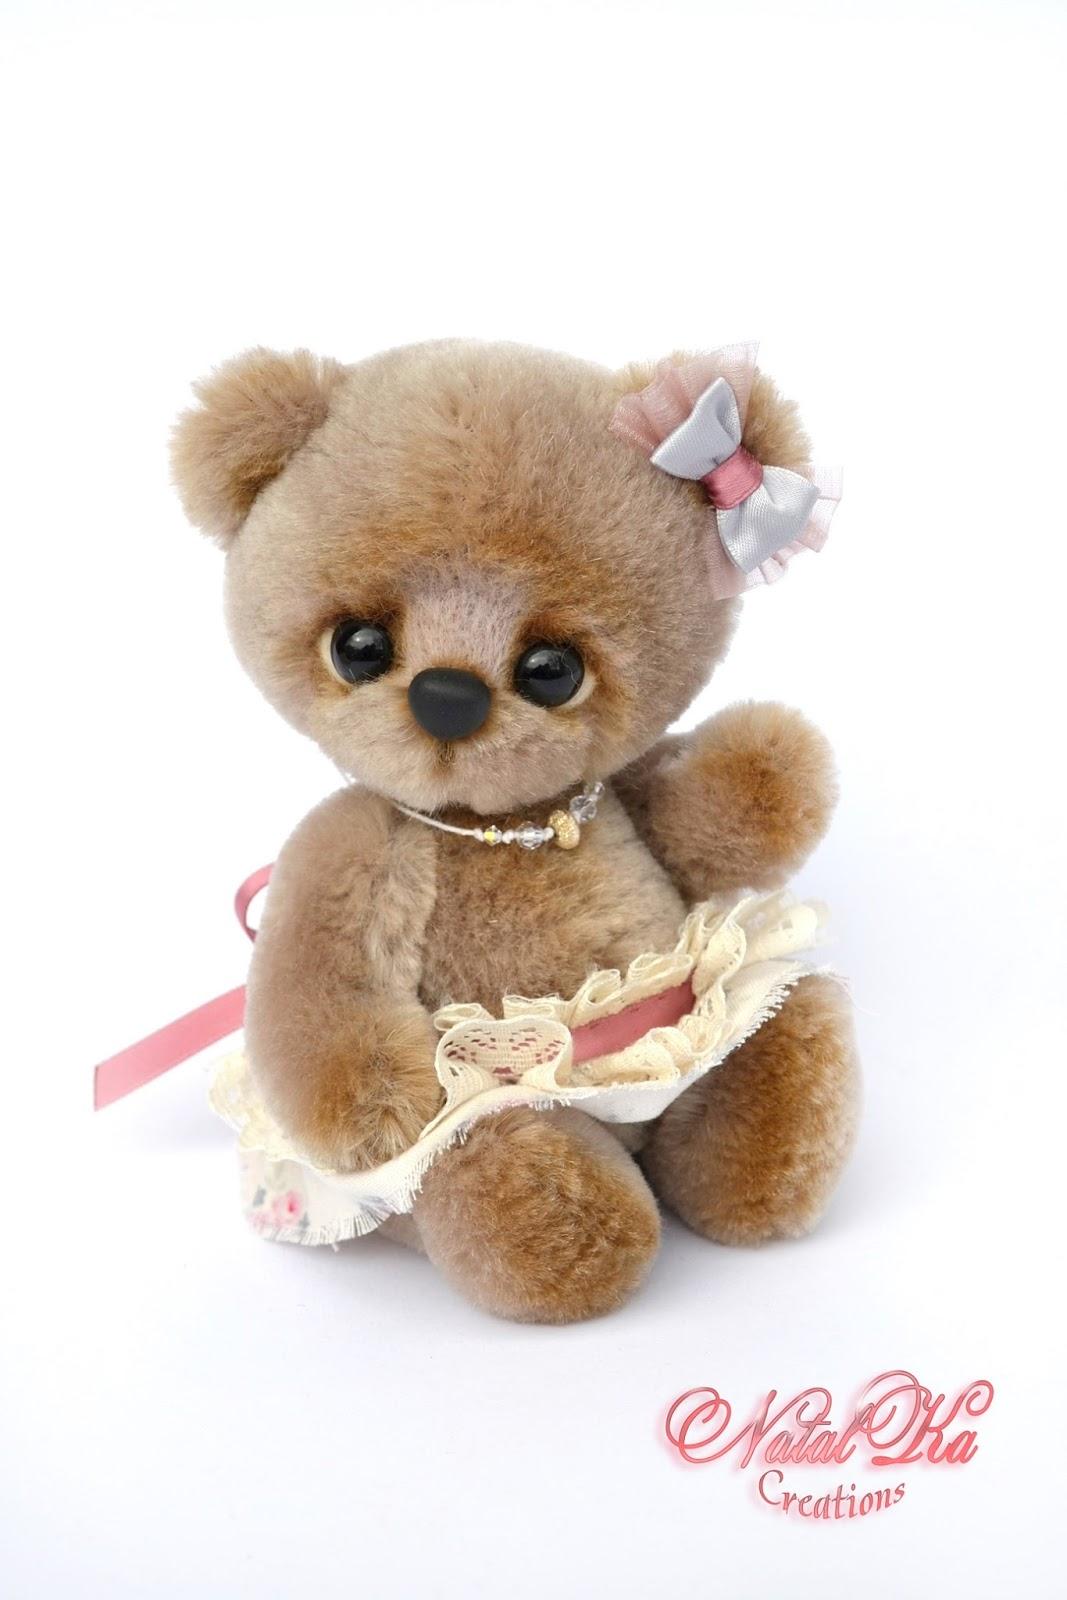 Artist teddy bear, jointed bear, handmade bear, ooak bear, авторский мишка тедди, медвежонок тедди, медведь тедди, Künstlerteddy, Künstlerbär, Teddybär, Teddy, handgemacht von NatalKa Creations